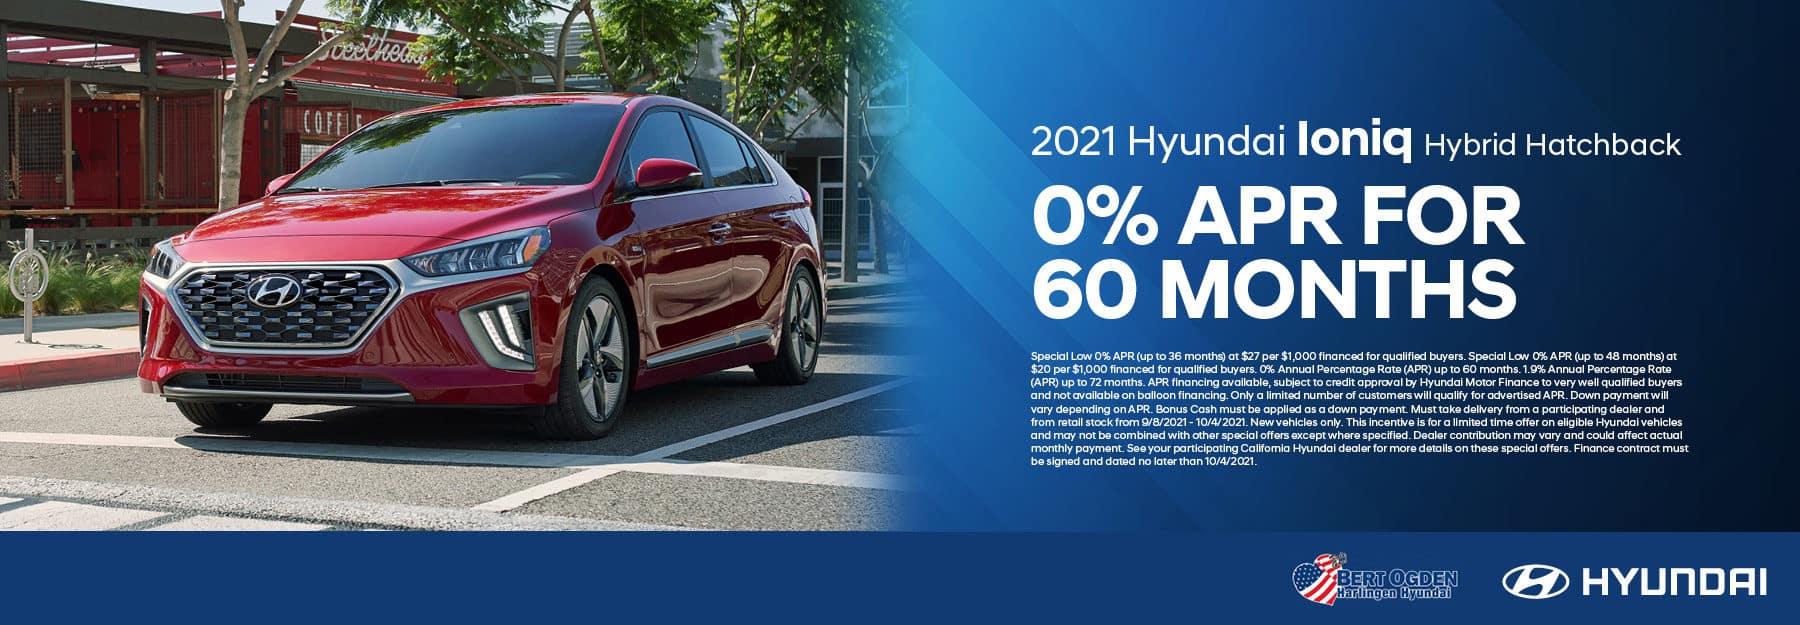 2021 Hyundai Ioniq Hybrid Offer   Bert Ogden Hyundai in Harlingen, Texas